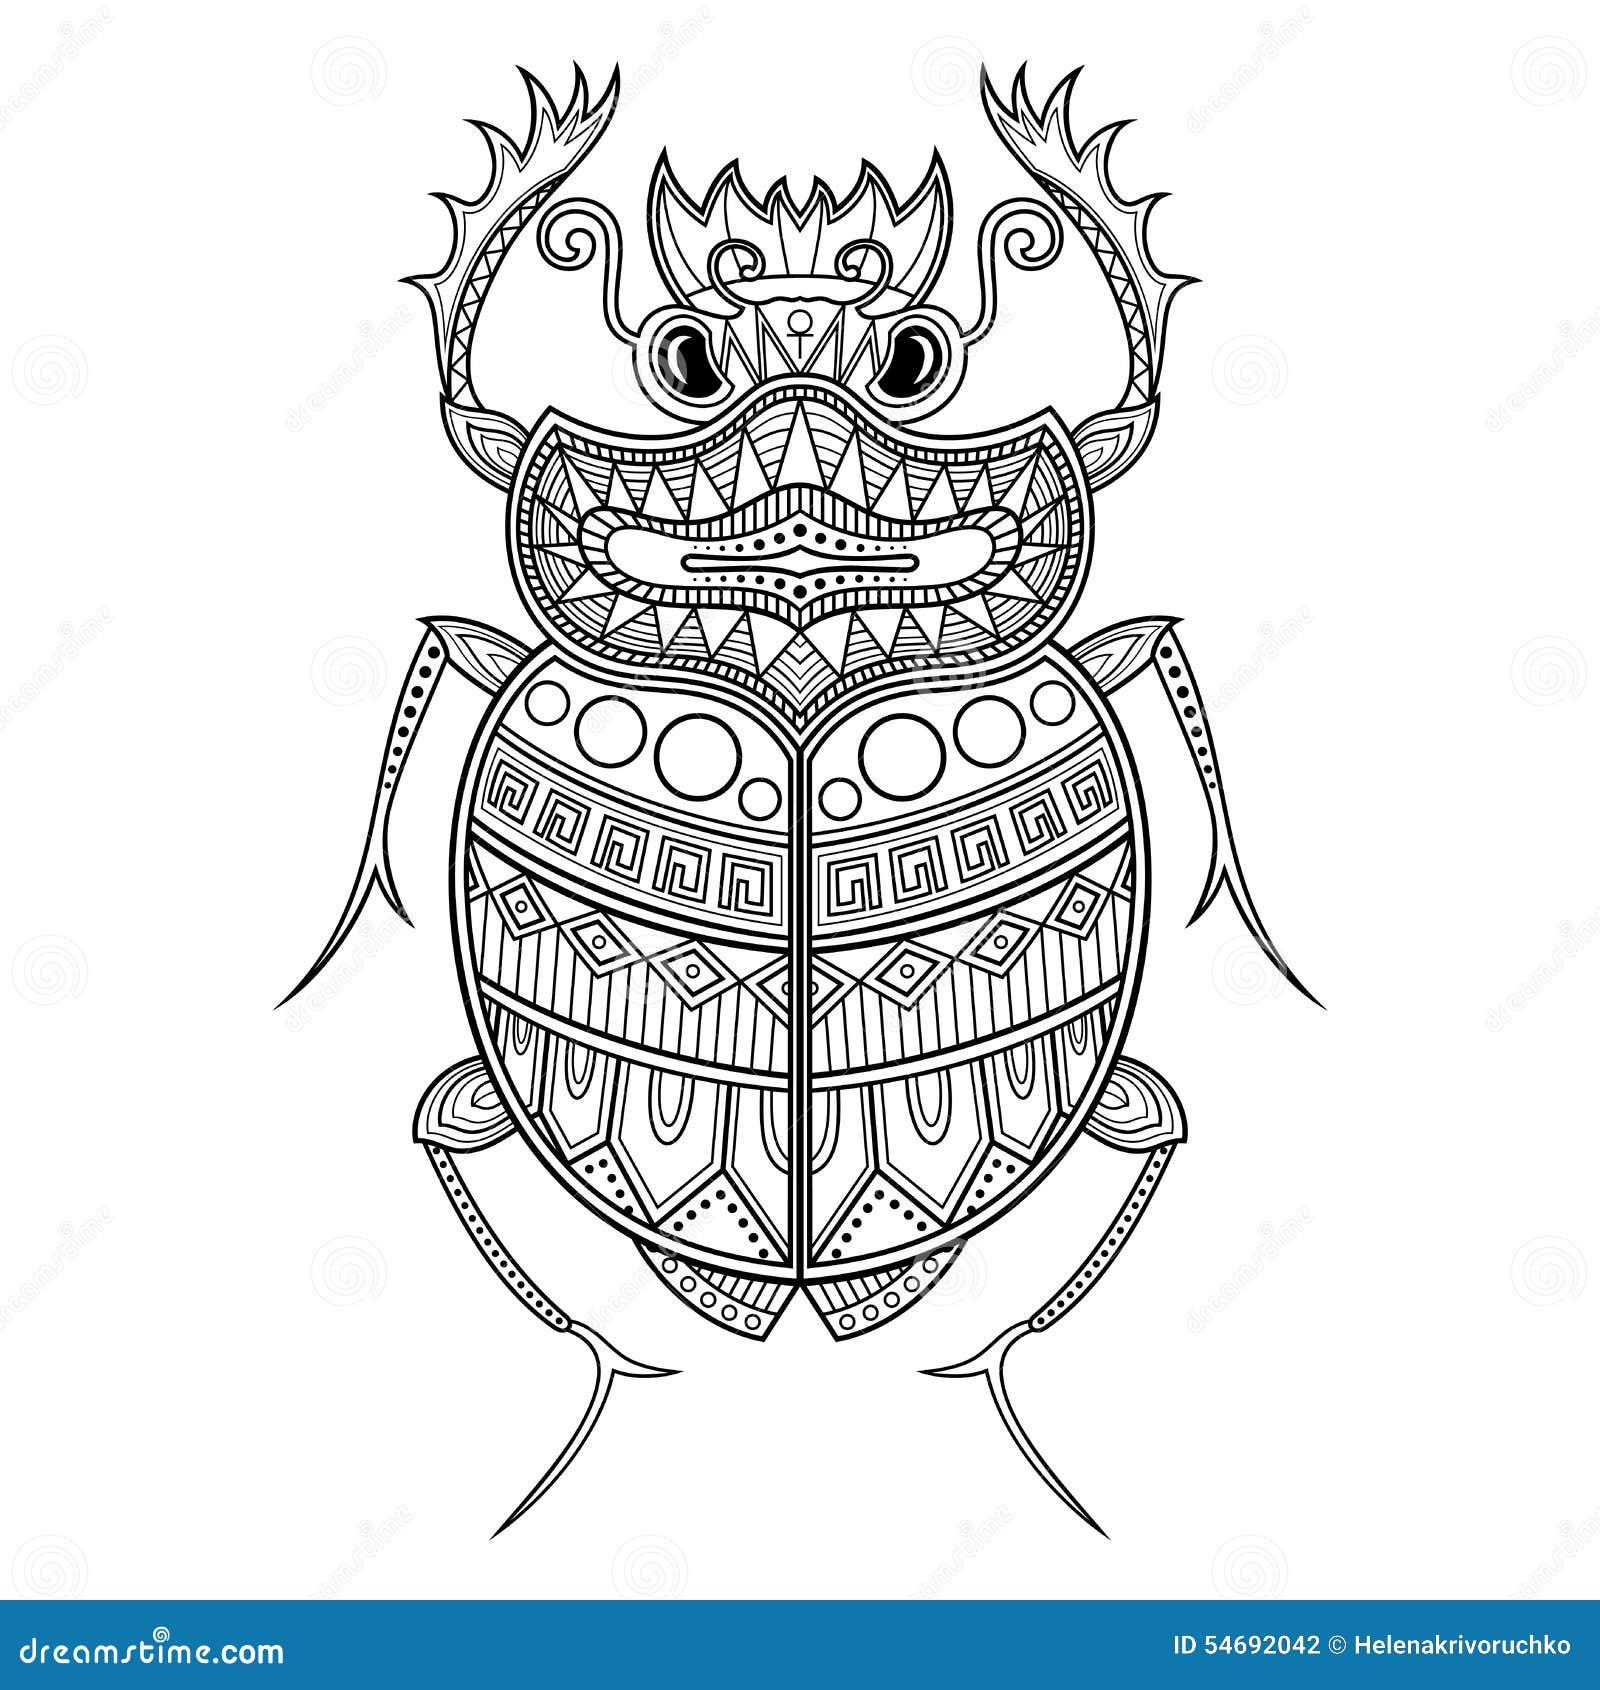 Set Of Crosses 1692725 further 414542340675988053 furthermore Stock Illustration Hand Drawn Artistically Egypt Horus Falcon Patterned Ra Bird Zentangle Style Wisdom Symbol Athena Tattoo T Shirt Adult Image65143391 likewise Weatherproof Vinyl Sticker Paw Print Dog moreover Significati H. on ankh tattoo